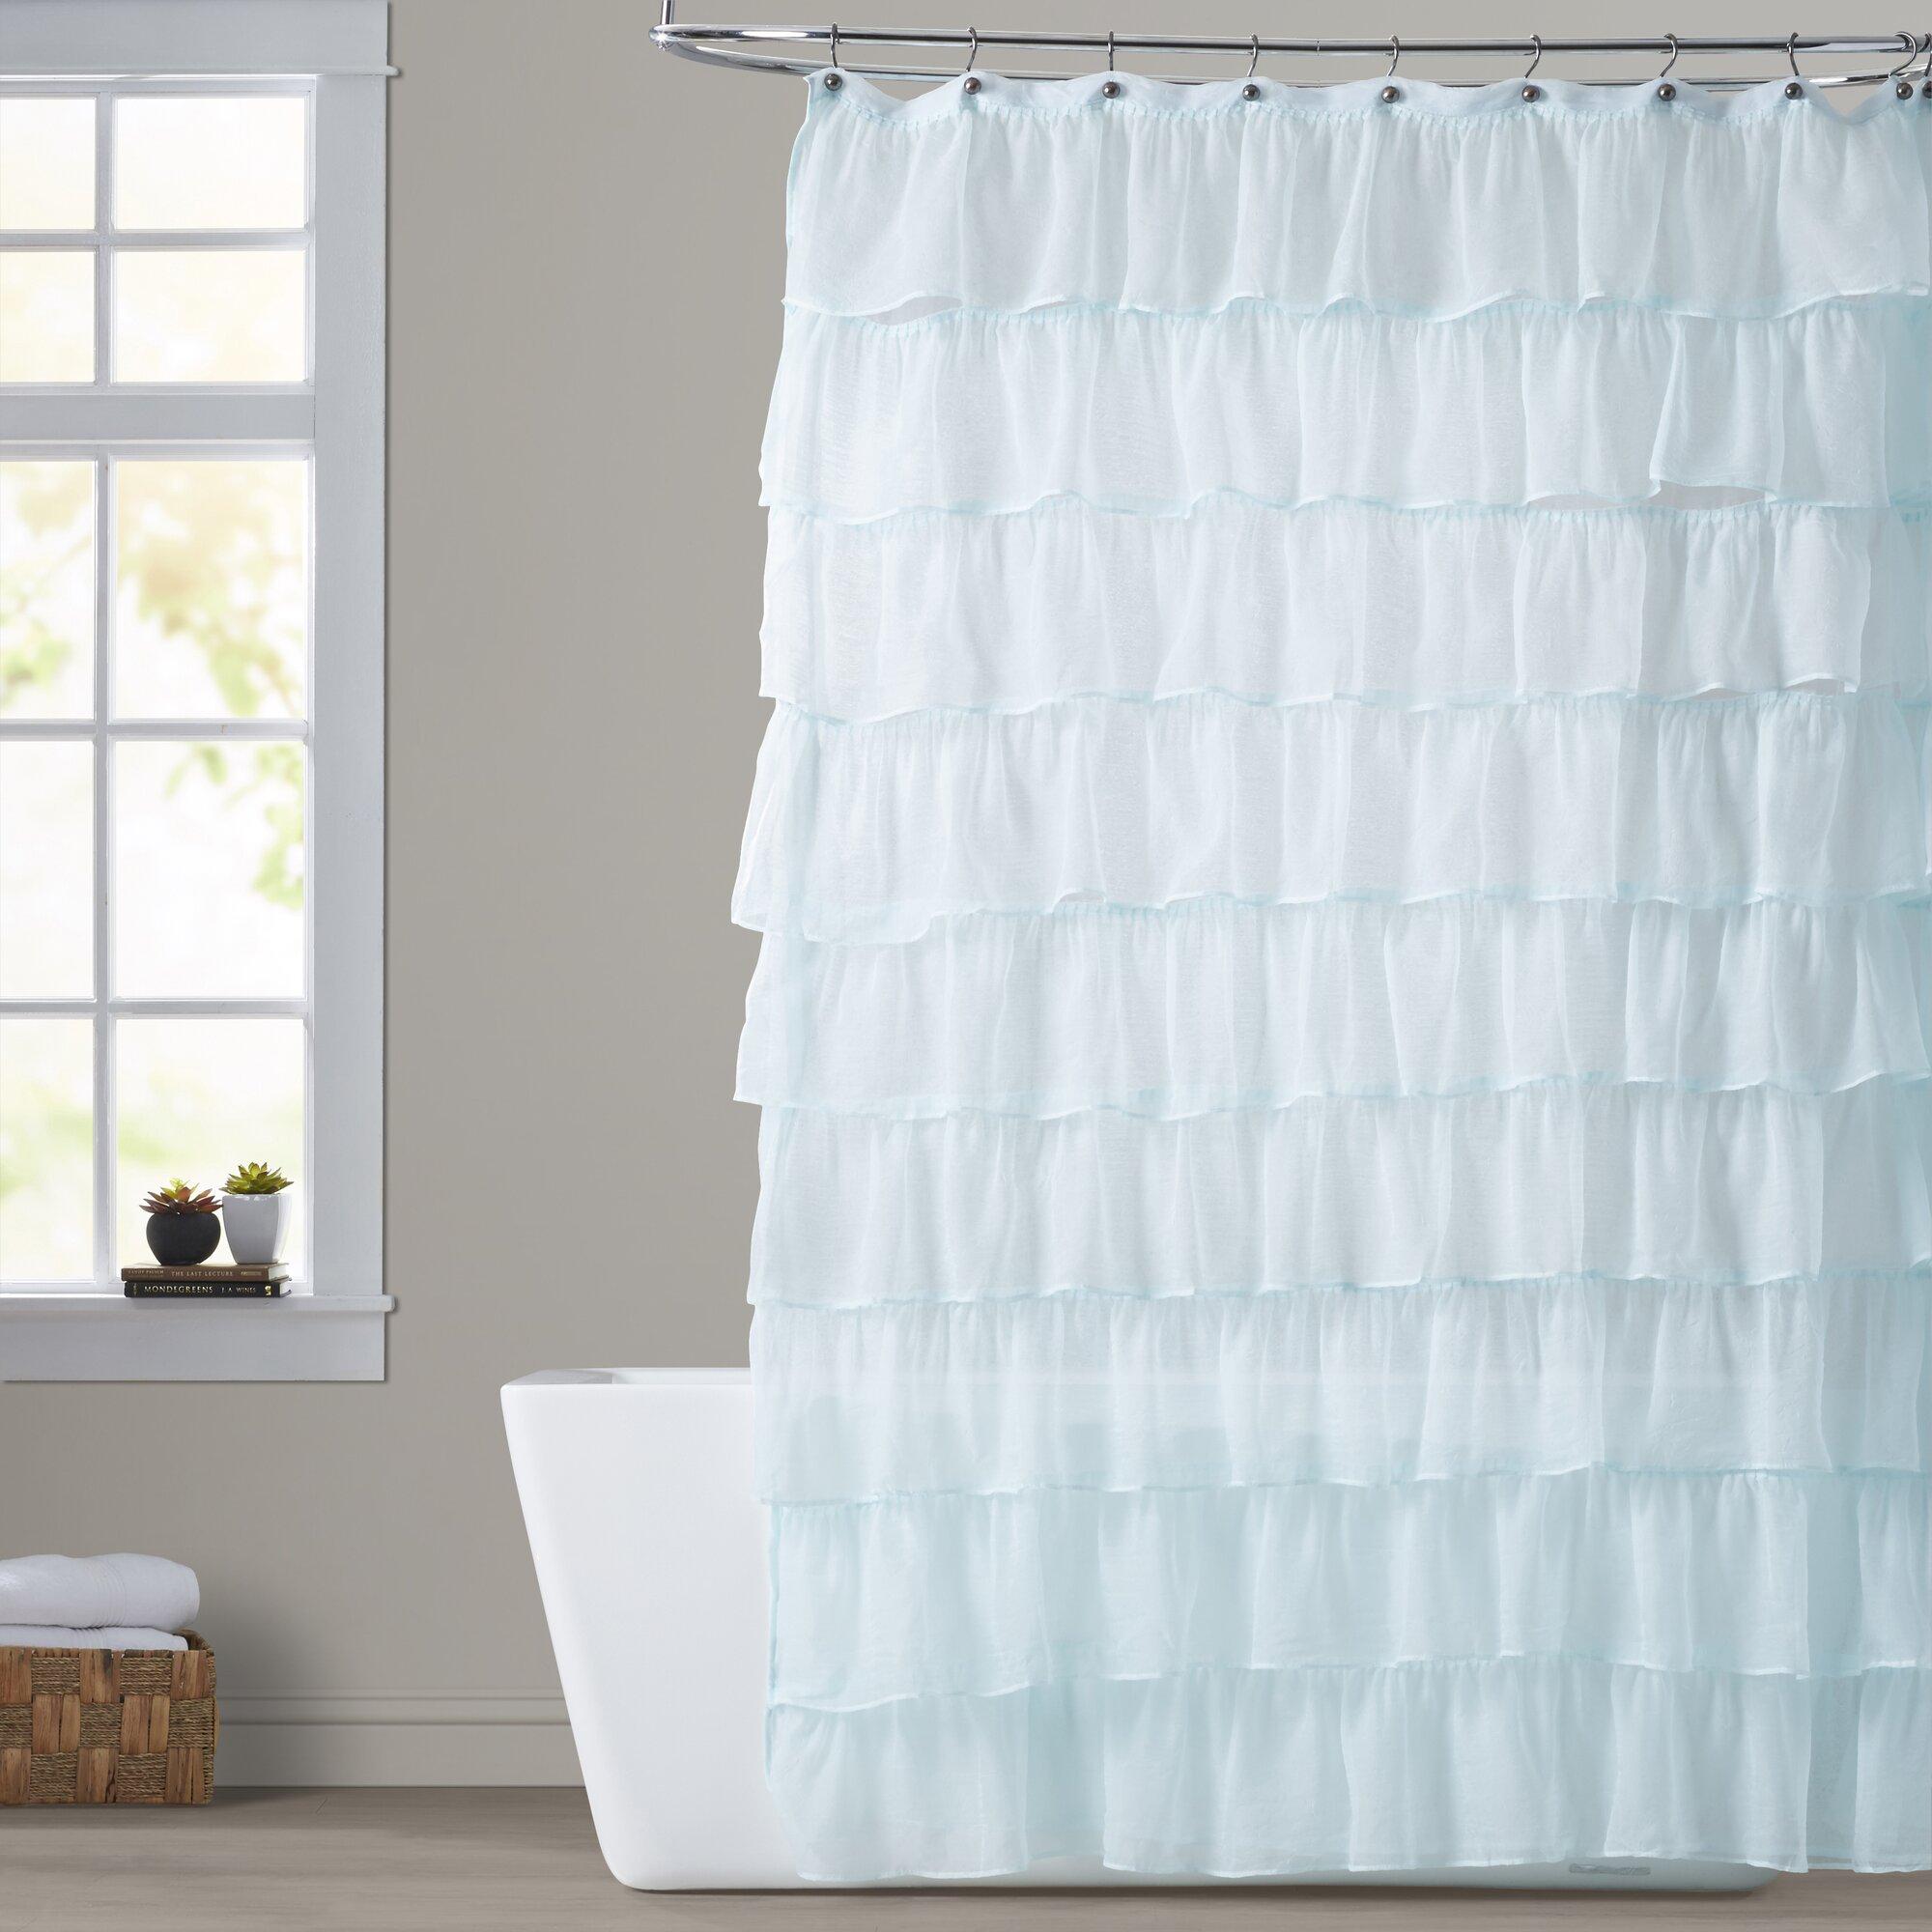 White Cotton Ruffle Shower Curtain. Elegant Ruffle Shower Curtain ...